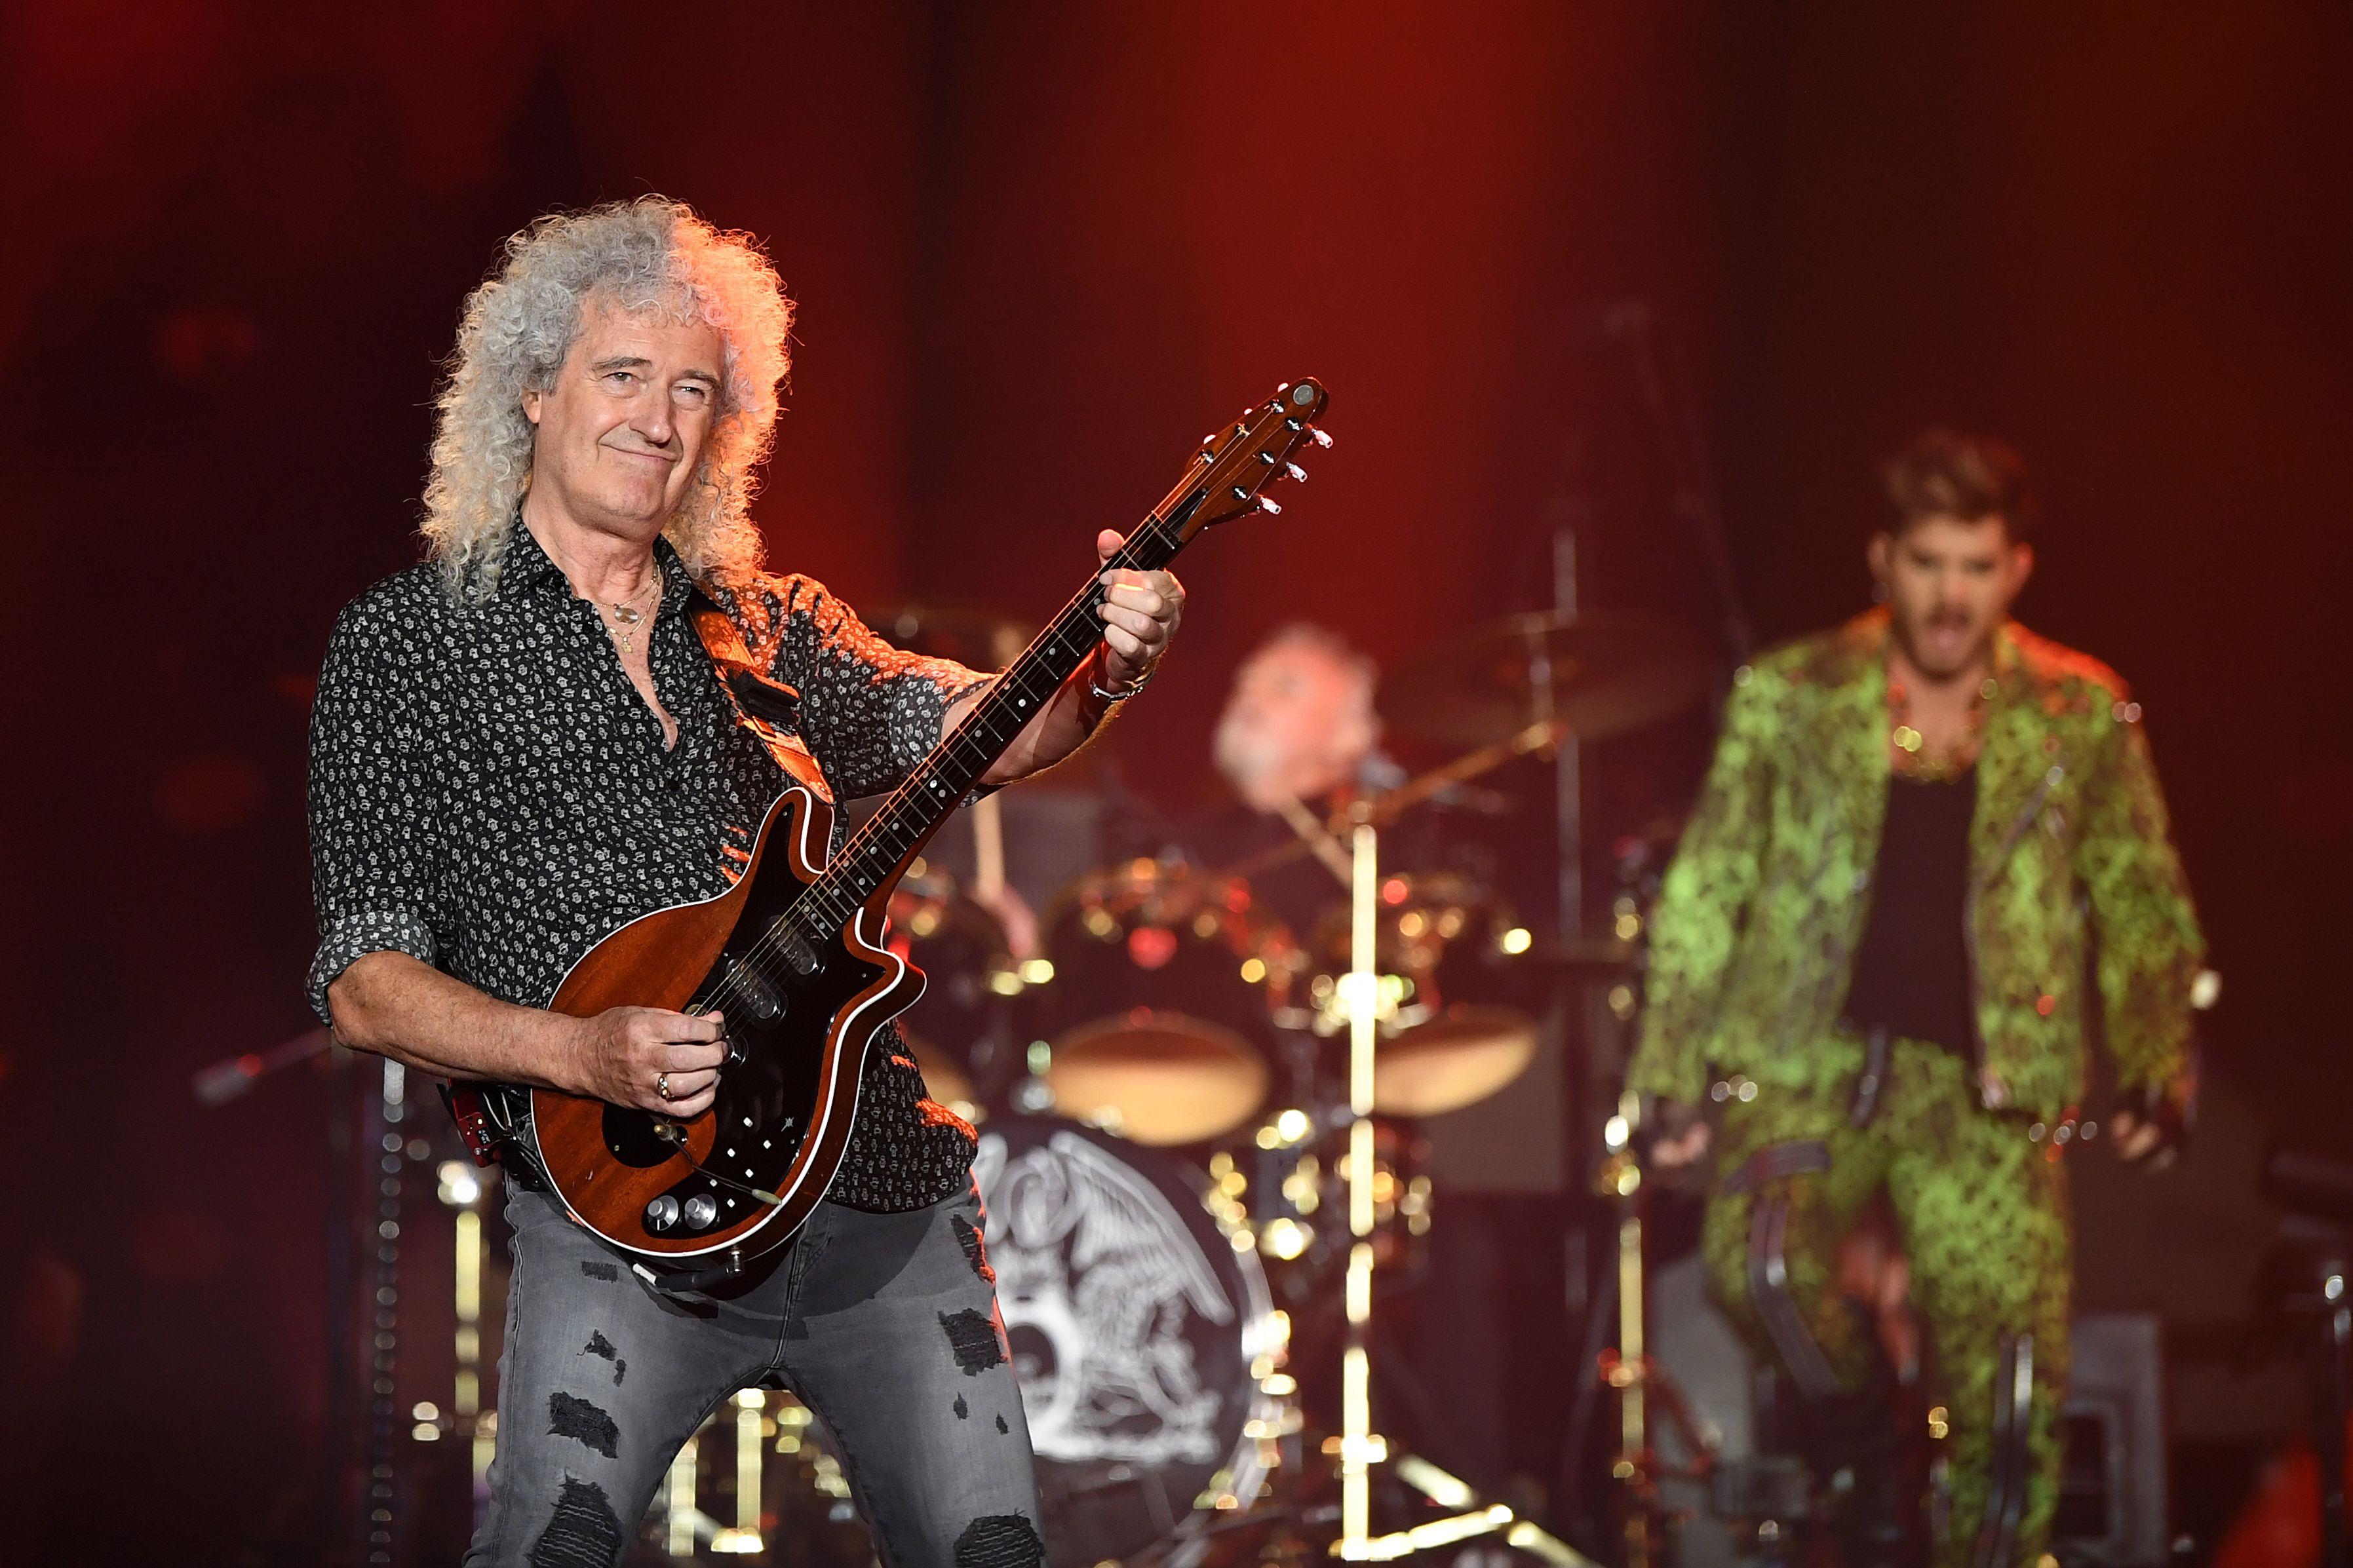 Watch Queen With Adam Lambert Replicate 1985 Live Aid Set at Australia Fire Fight Benefit Gig